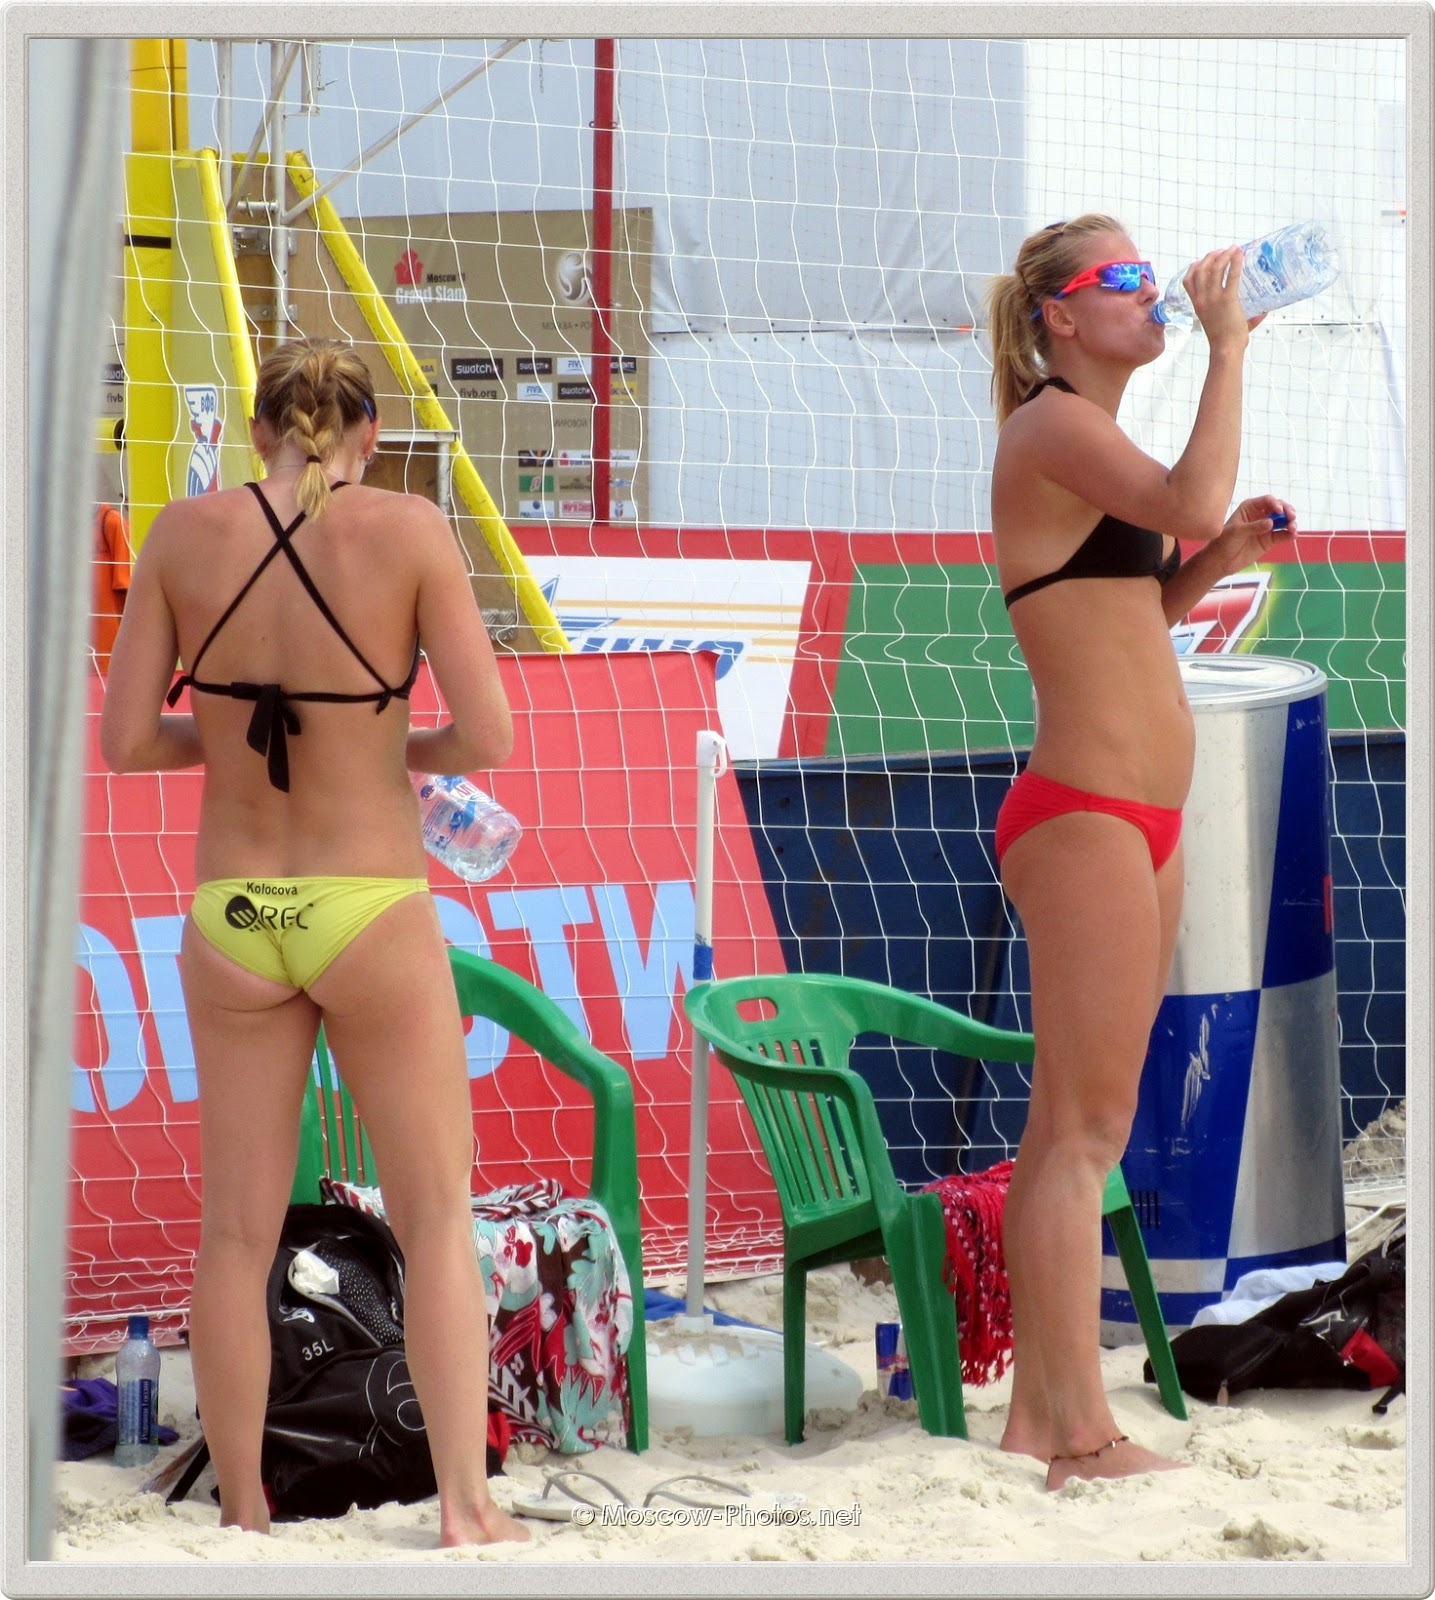 Hot Girls, Hot Sand, Hot Summer! (Kristyna Kolocova & Marketa Slukova)